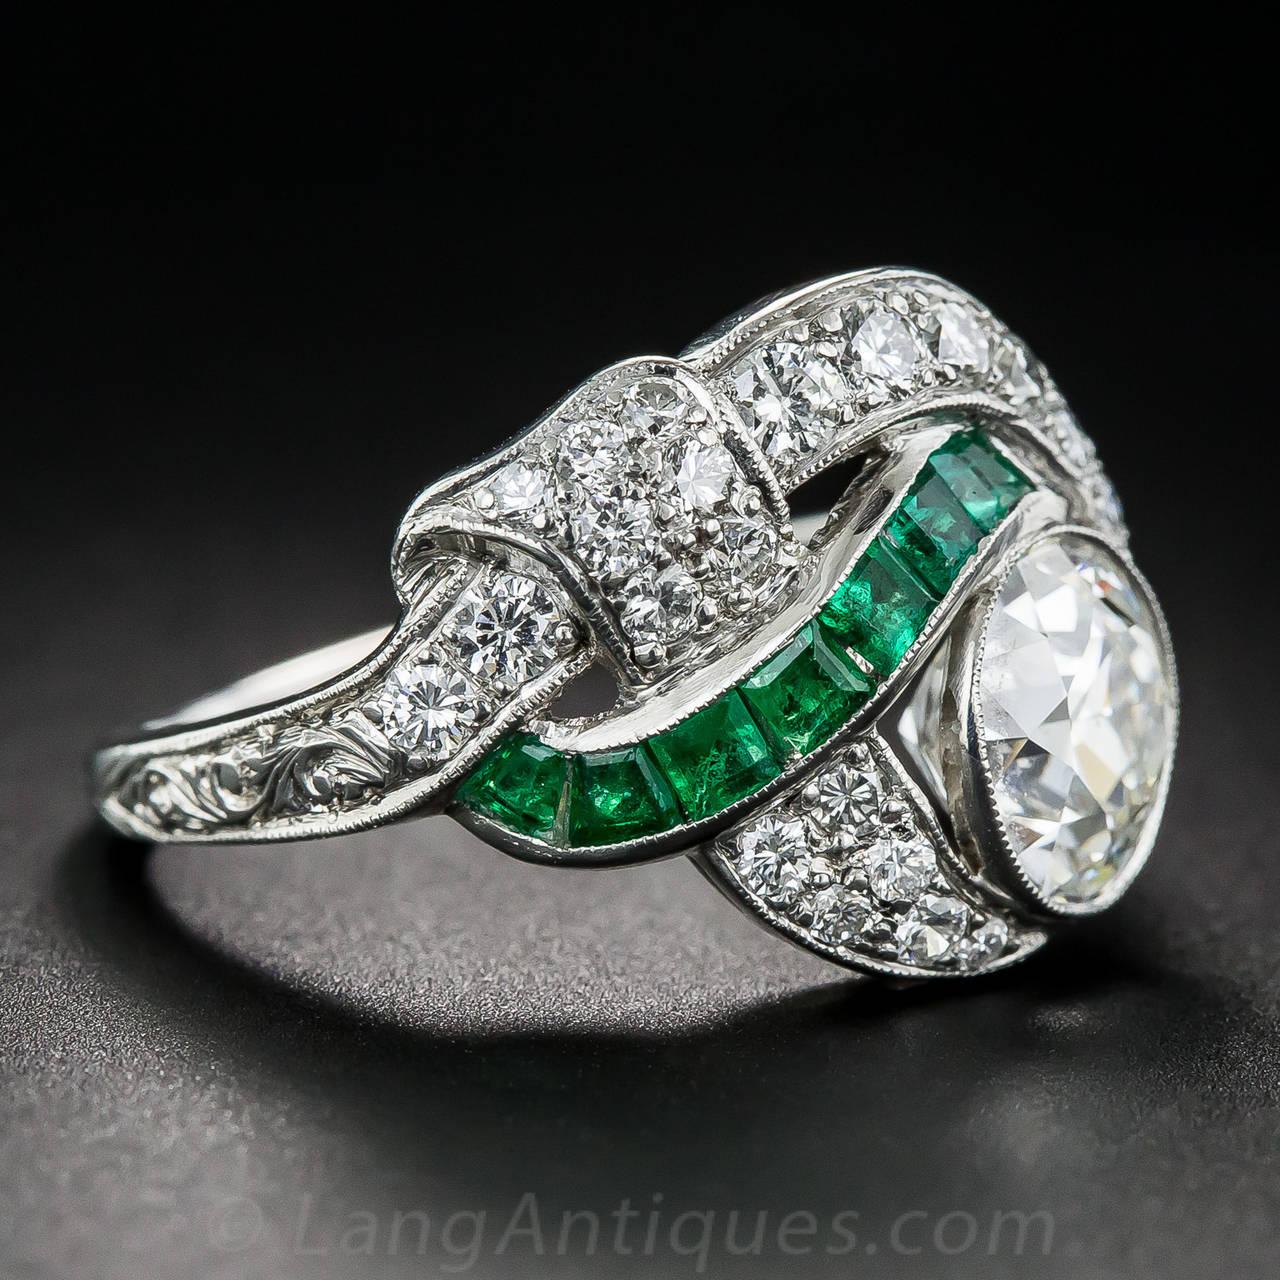 Art Deco 1.97 Carat Center Diamond and Emerald Ring 3